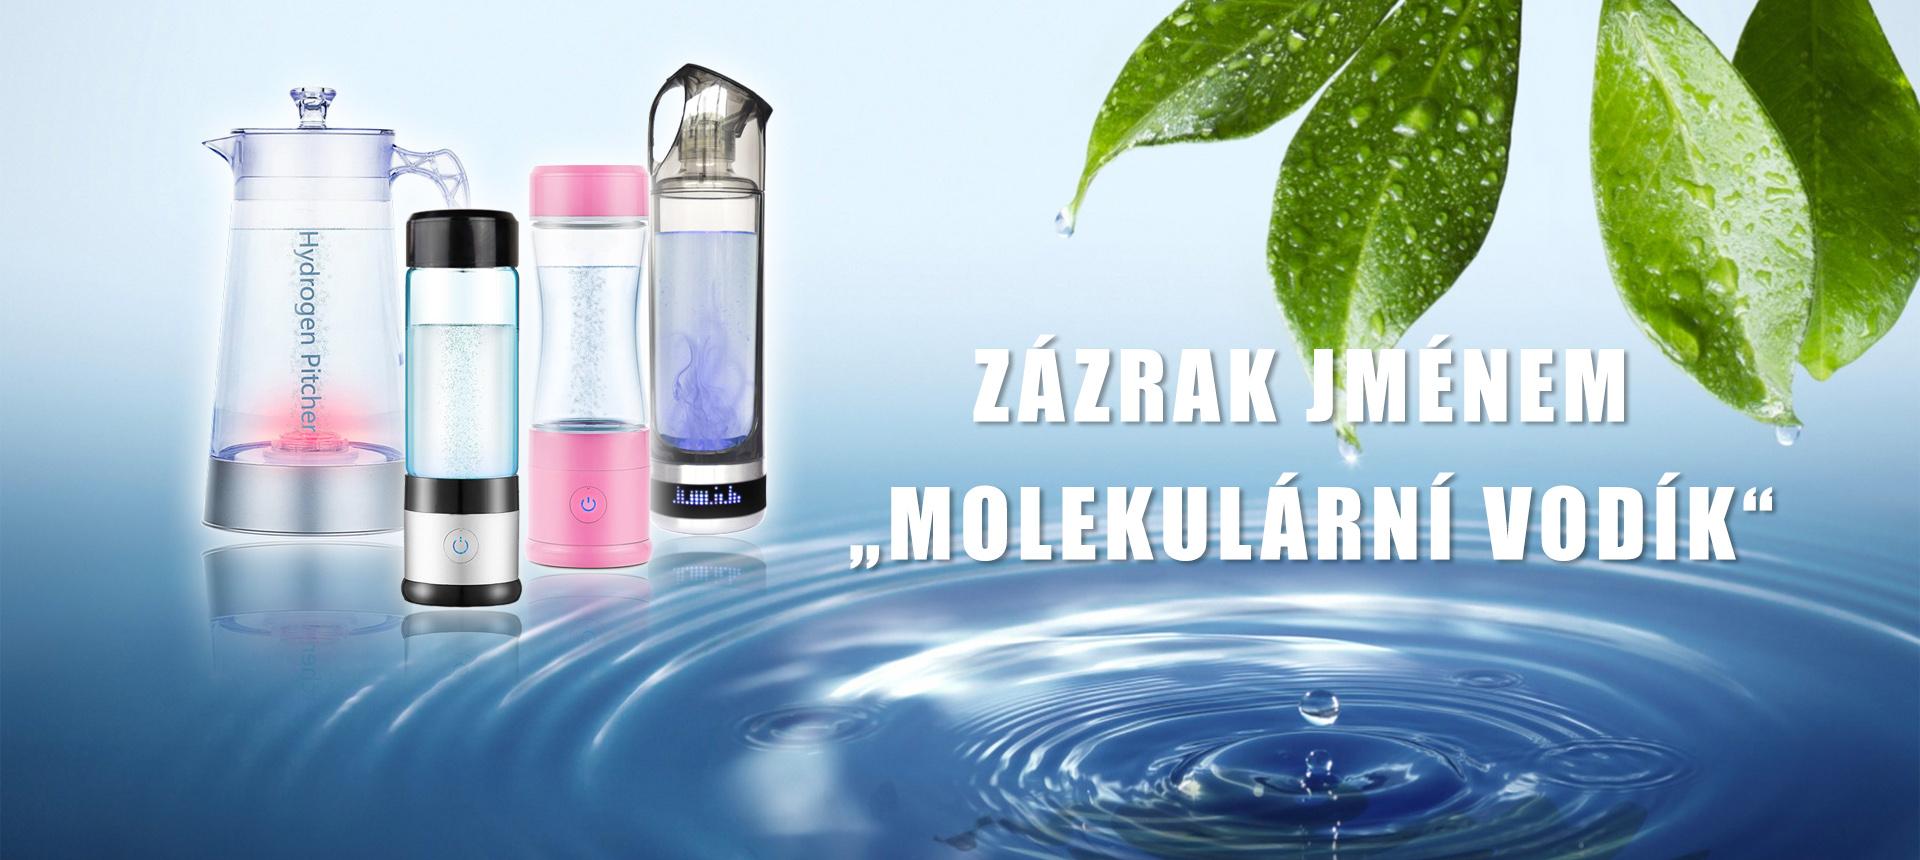 Lahve na výrobu molekulárního vodíku